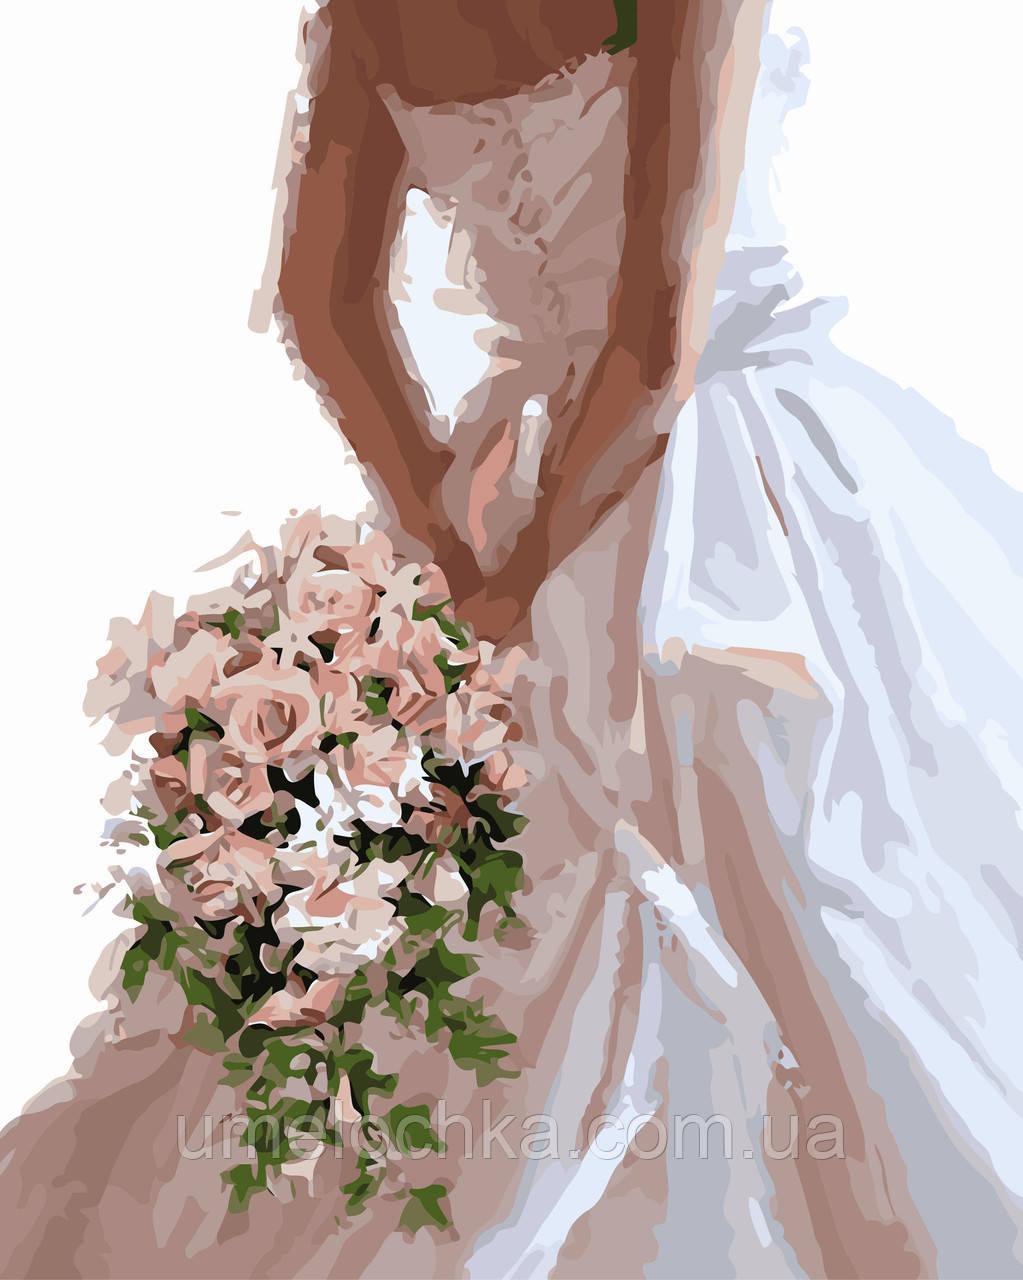 Картина-раскраска Букет невесты Худ МакНейл Ричард (BRM-GX8045) 40 х 50 см